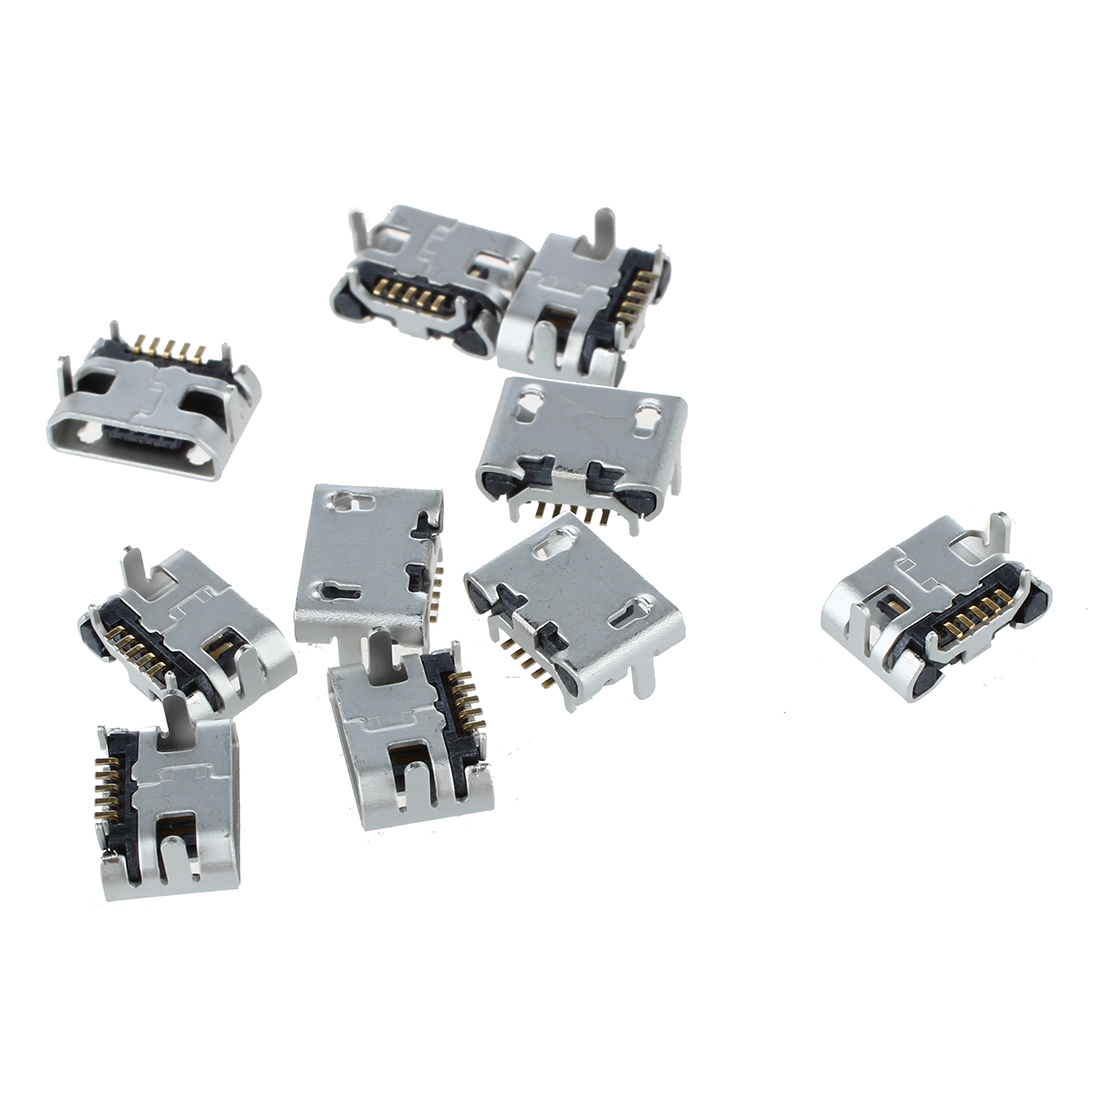 JFBL Hot  10 Pcs Type B Micro USB Female 5 Pin Jack Port Socket Connector Repair Parts(China)